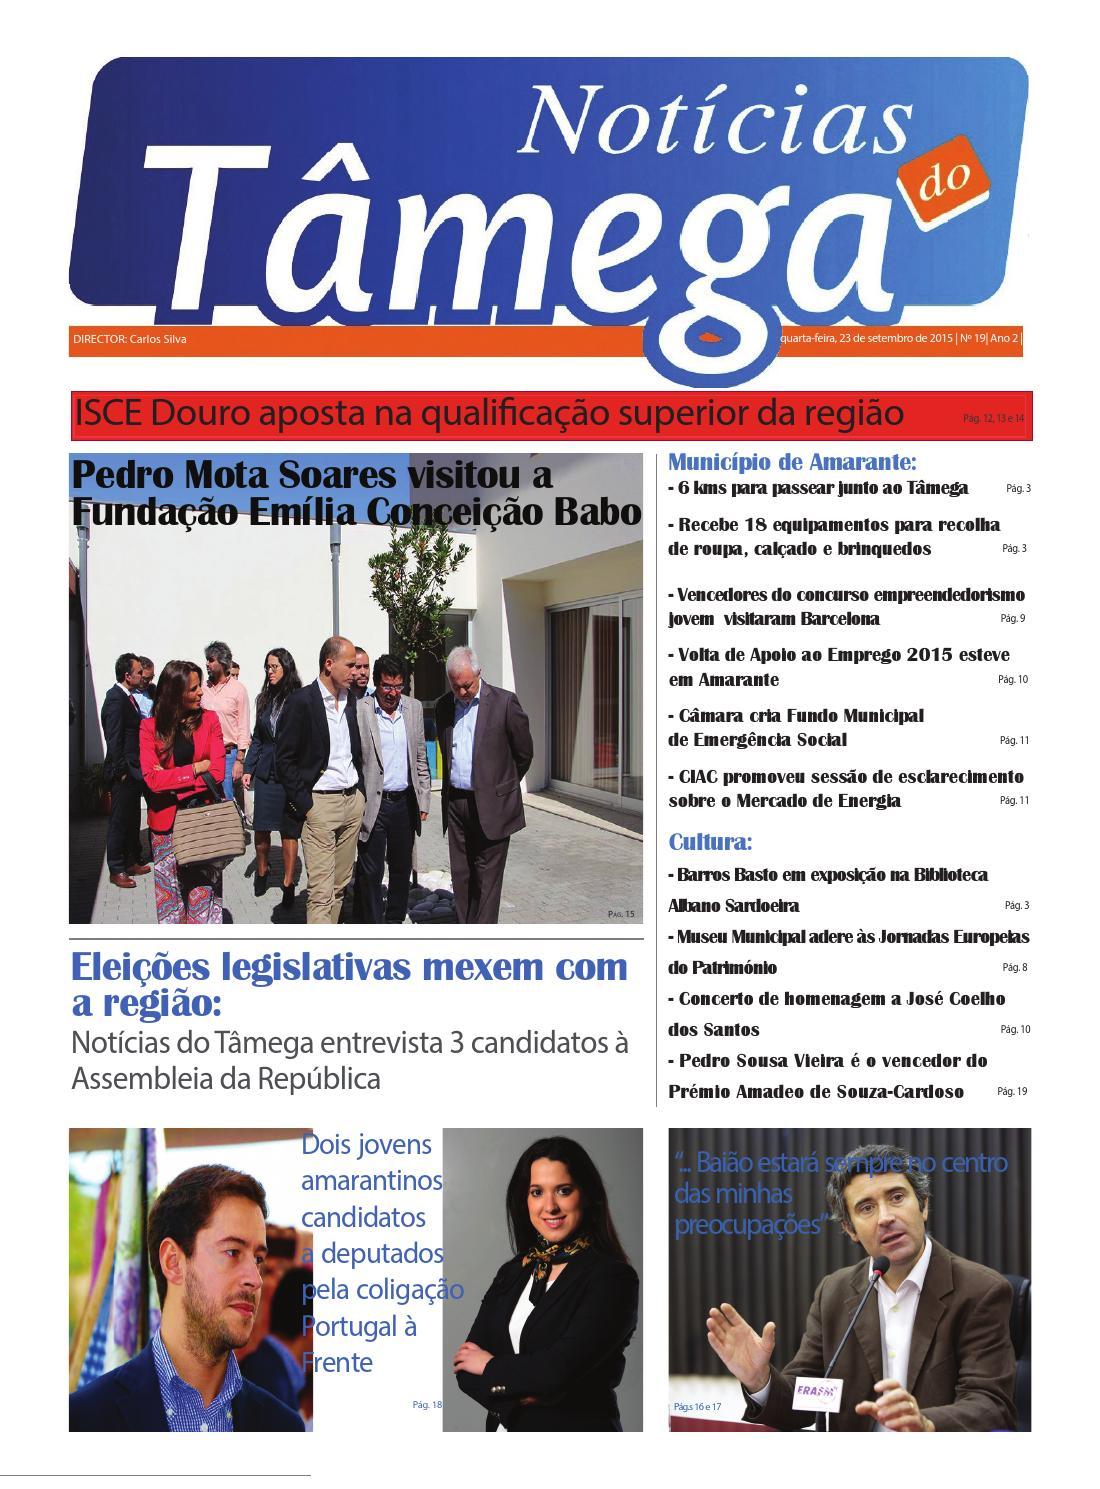 58b81c6b33 Notícias do tâmega nº 19 (23 setembro 2015) by MediaTâmega - issuu